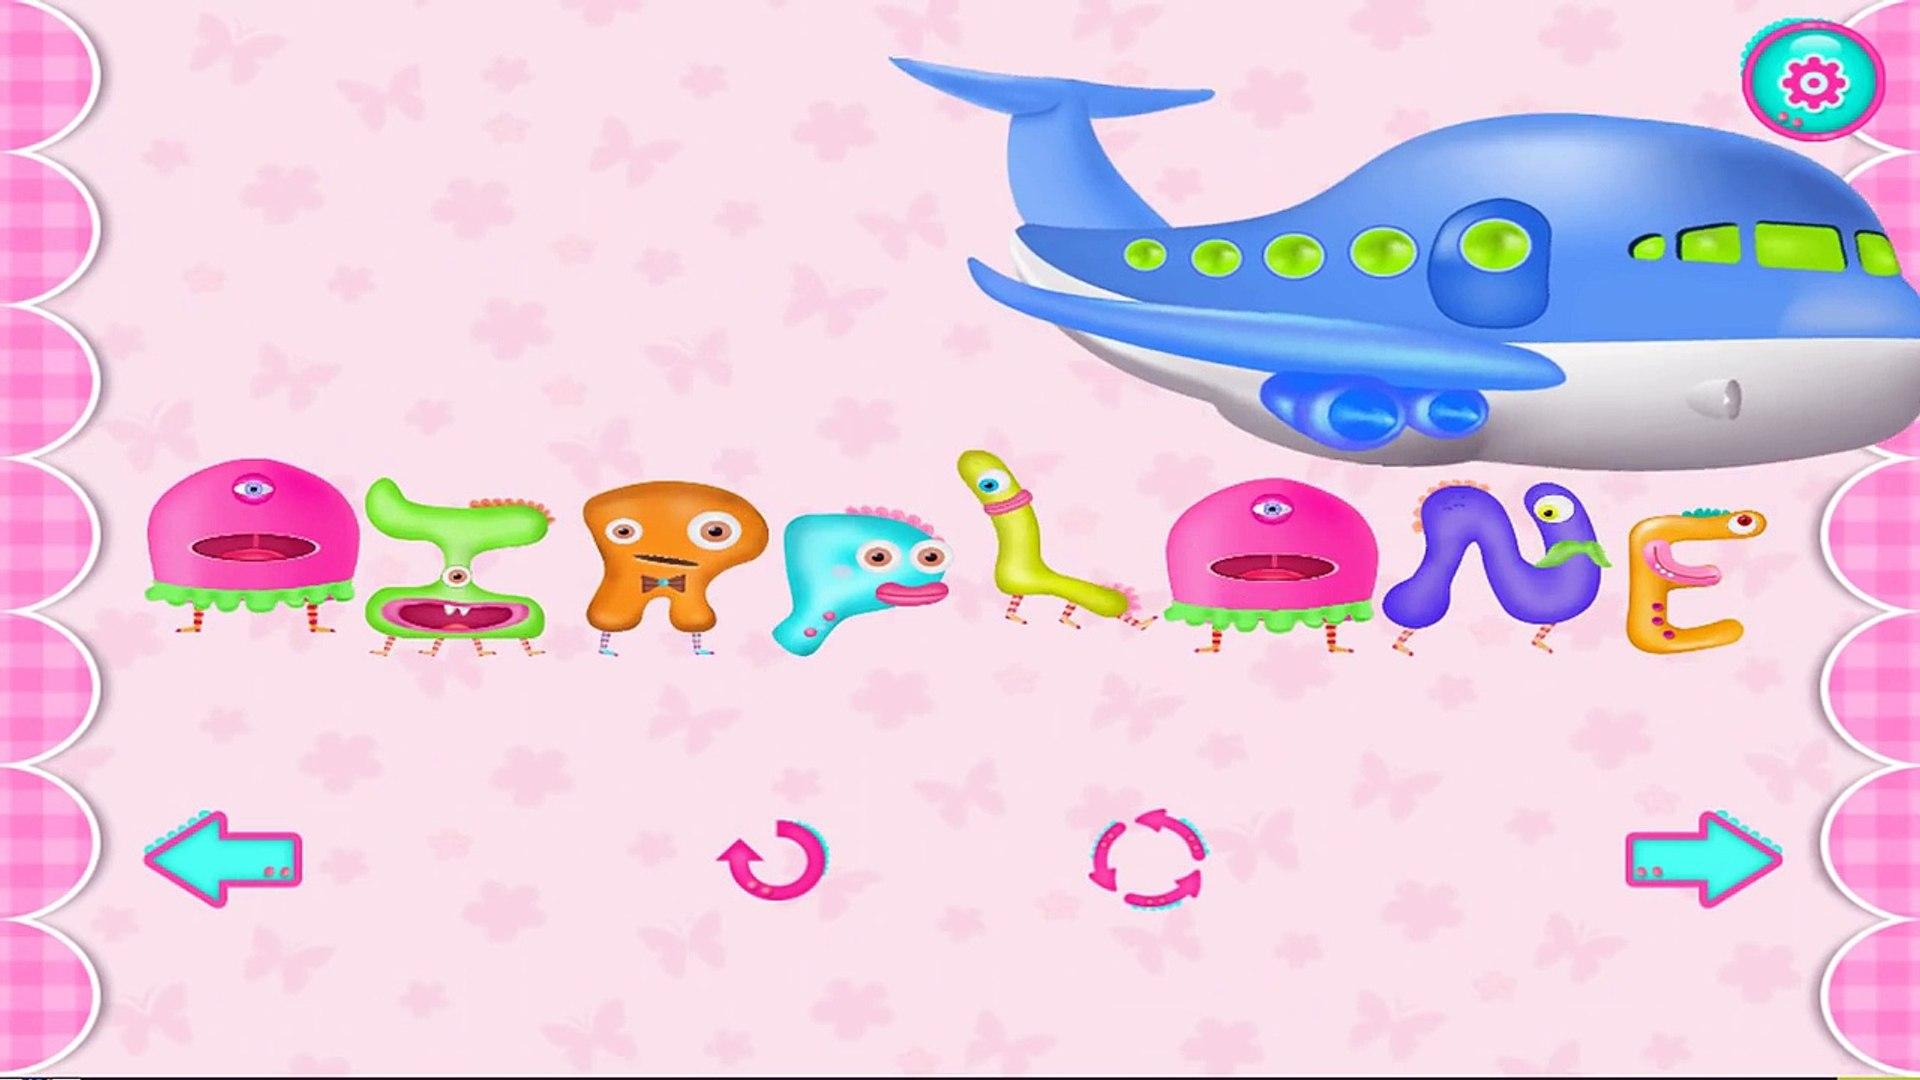 Preschool Words for Kids , Kids Learn Alphabet, Education App for Kids